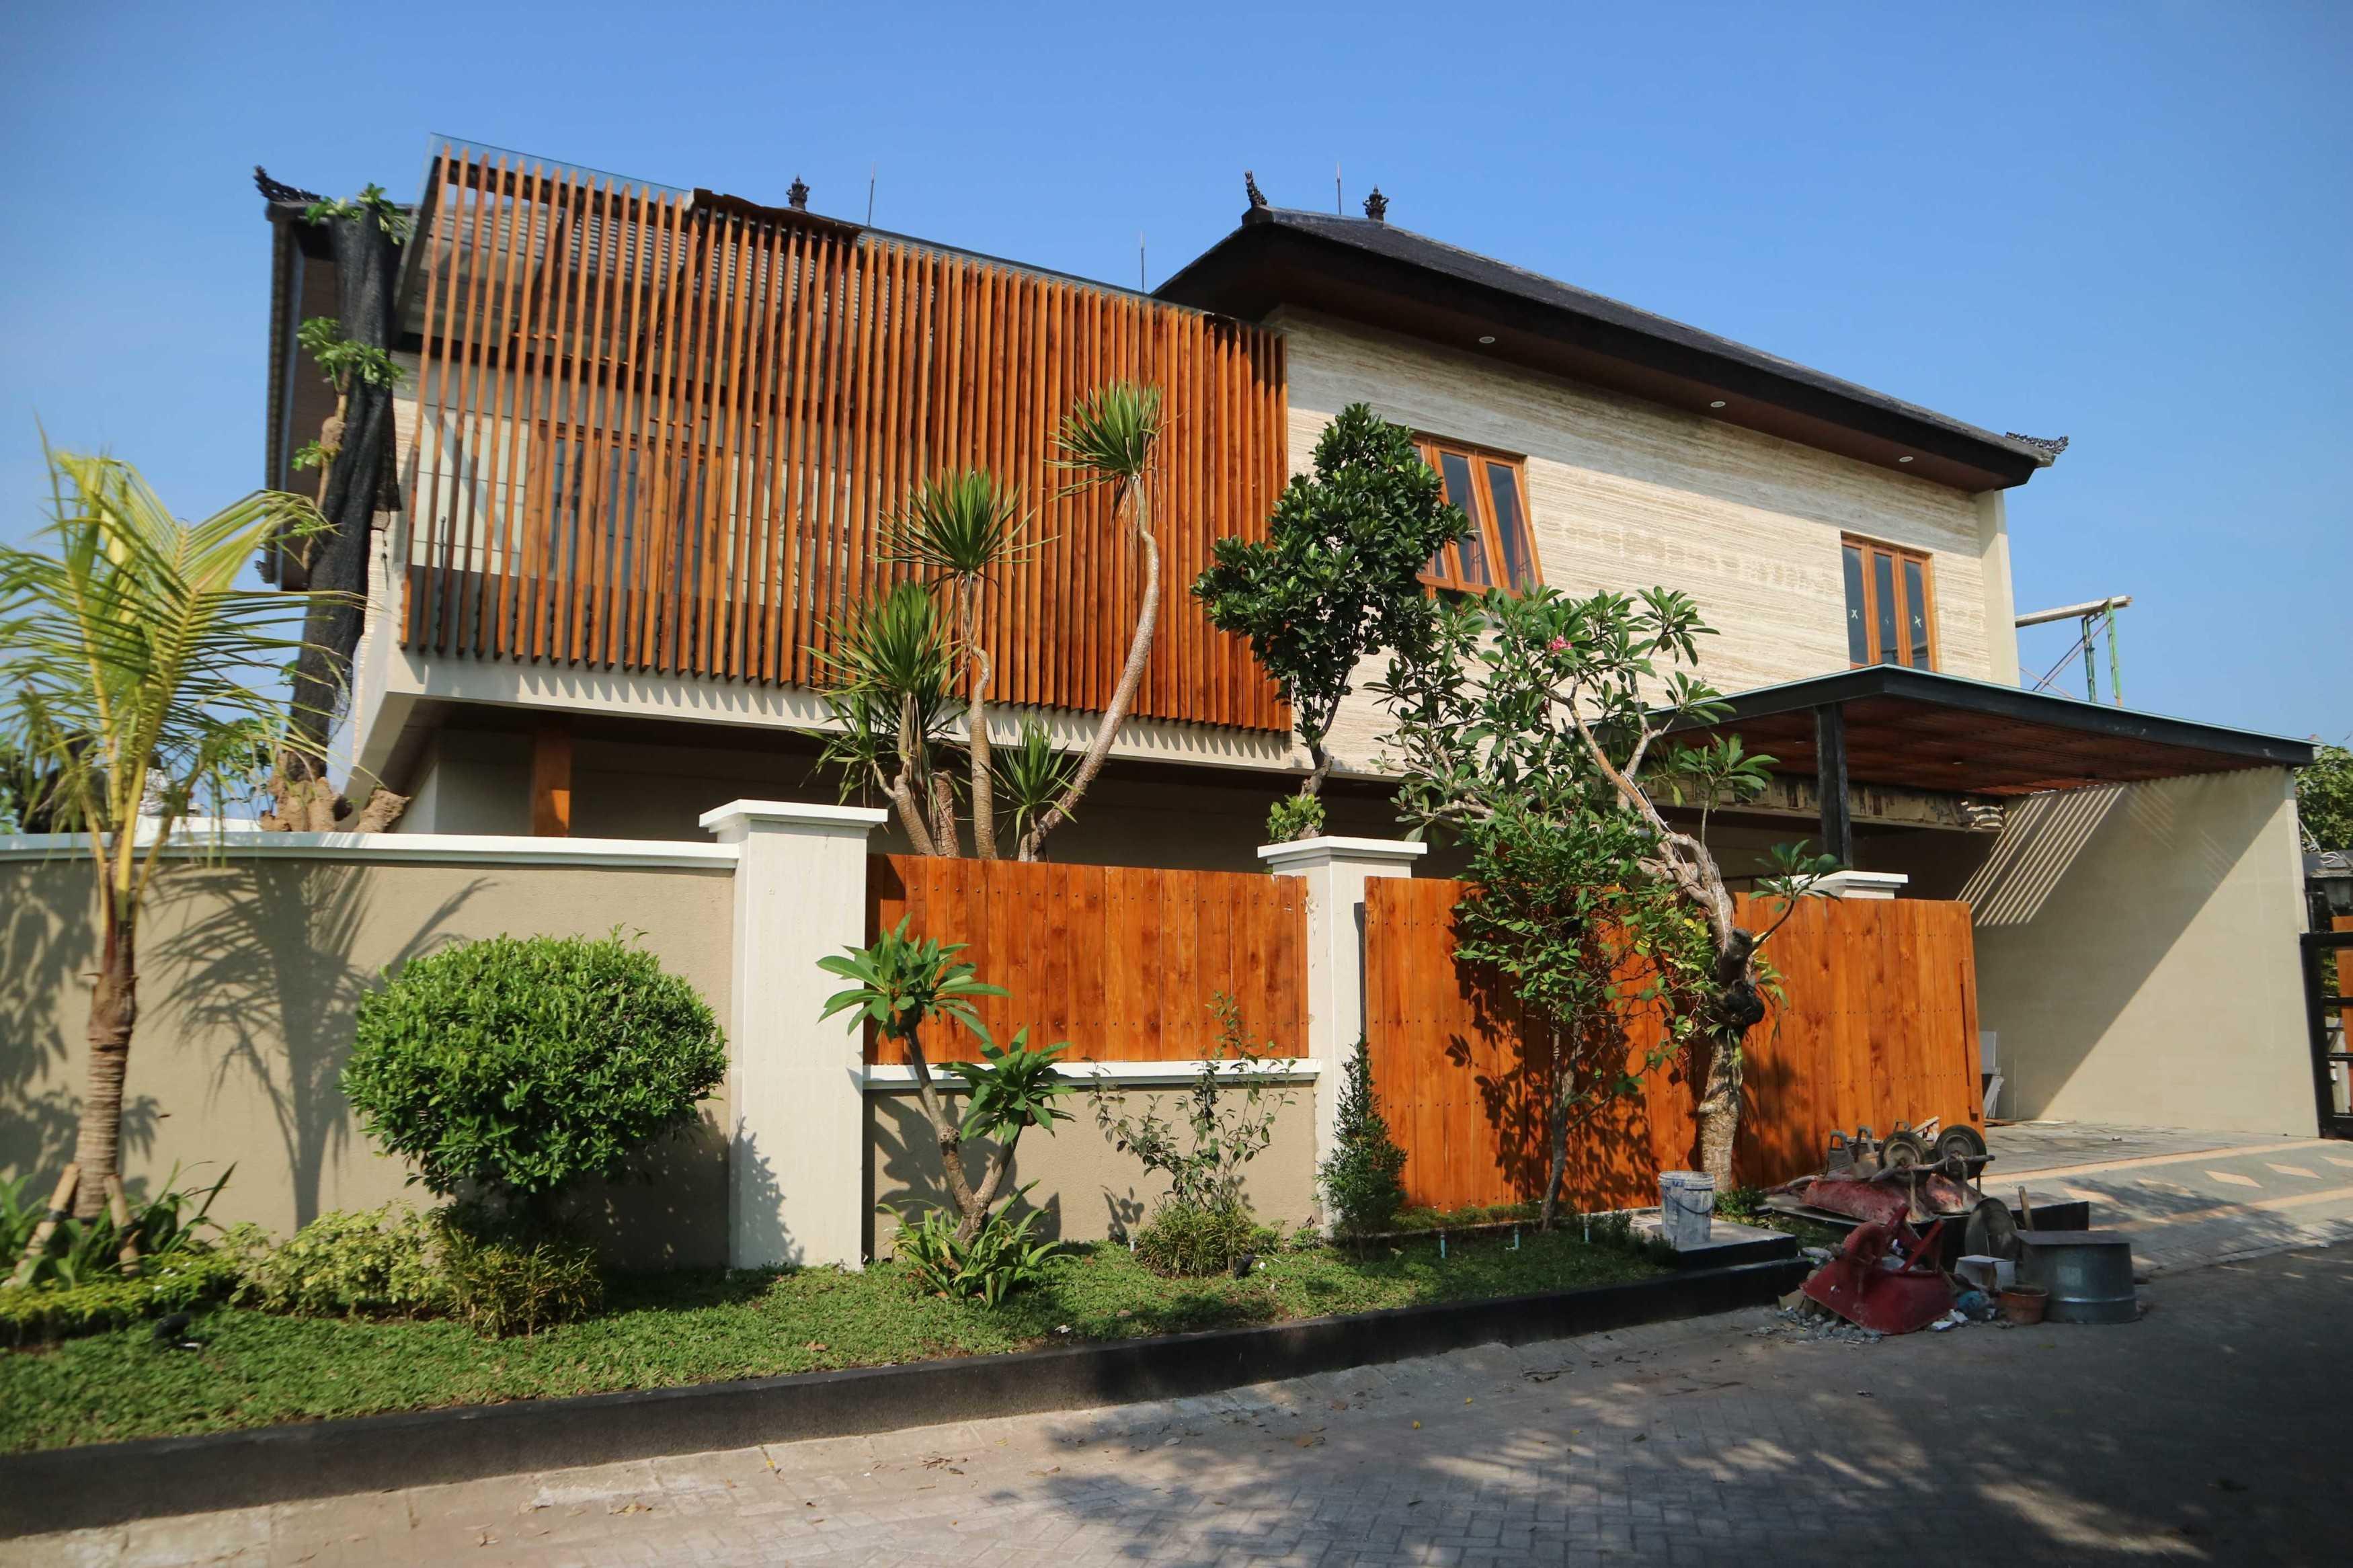 Arbiy Kreasi Rumah Pm Surabaya, Kota Sby, Jawa Timur, Indonesia Surabaya, Kota Sby, Jawa Timur, Indonesia Arbiy-Kreasi-Rumah-Pm   111184